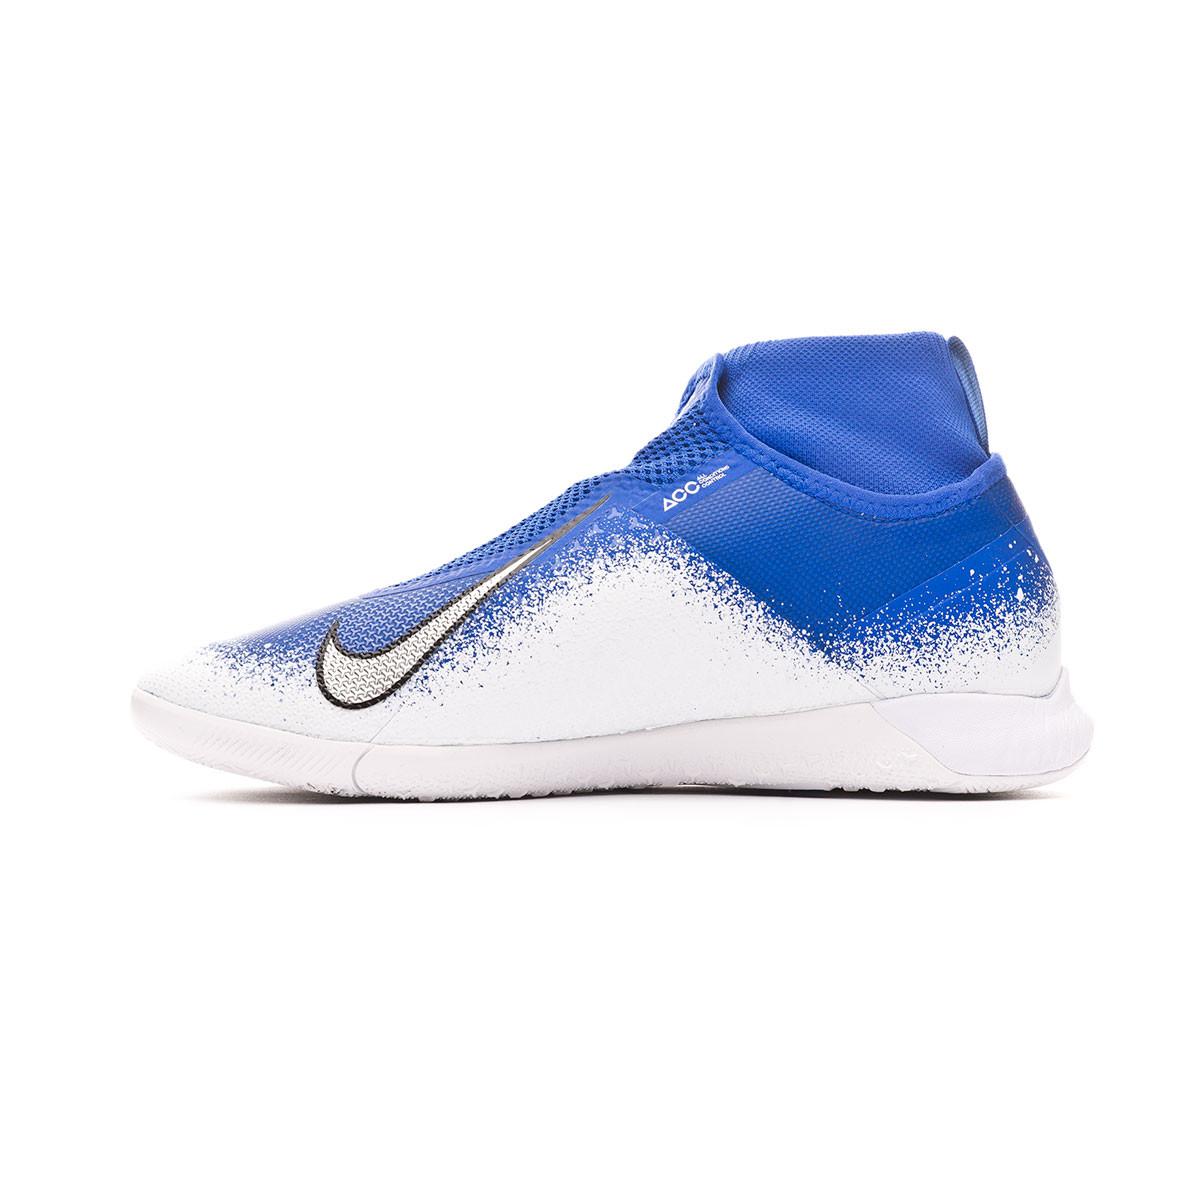 Juguetón Encogerse de hombros Cambio  Futsal Boot Nike React Phantom Vision Pro DF IC Racer blue-Chrome-White -  Football store Fútbol Emotion